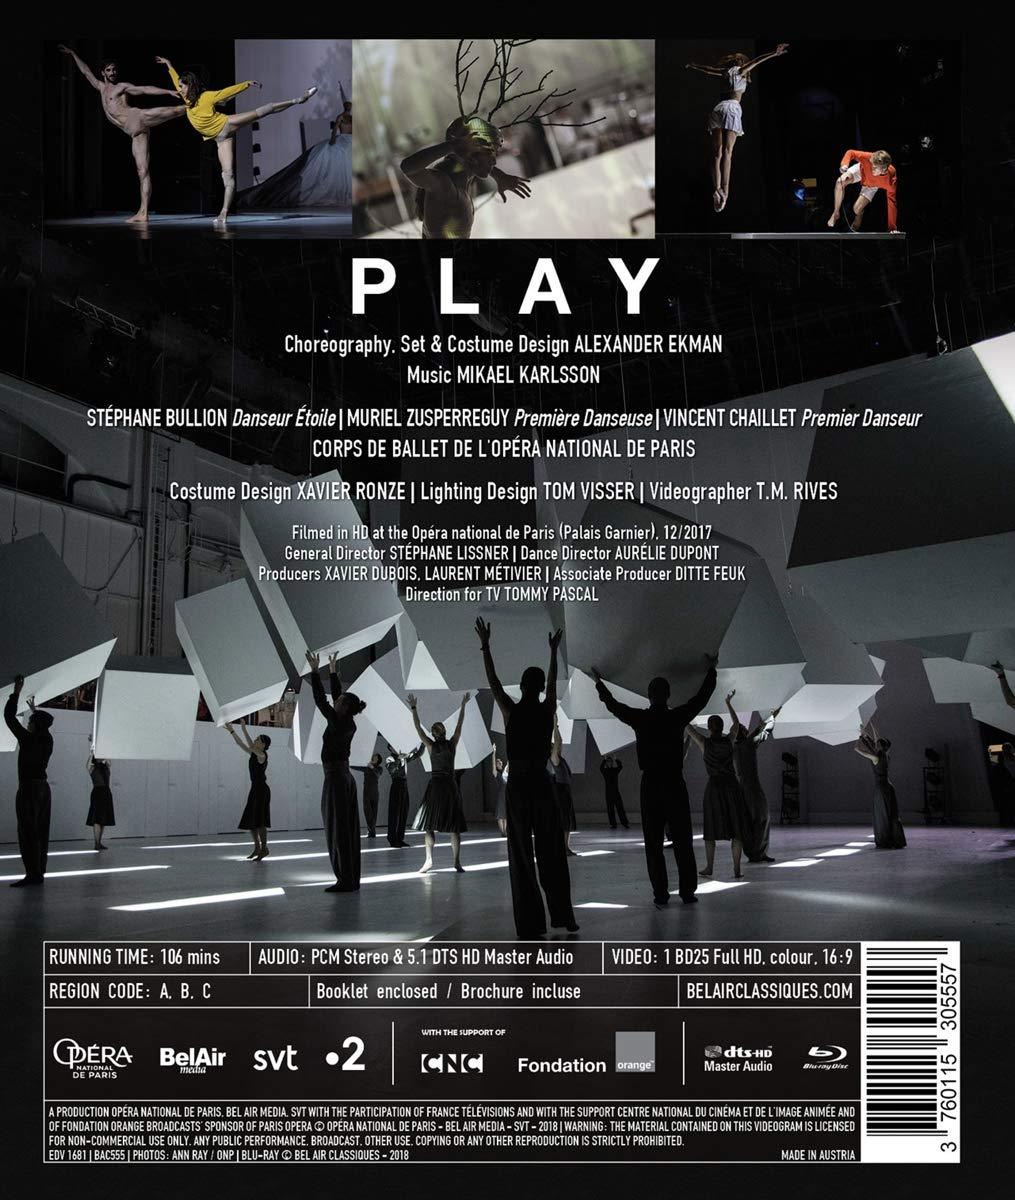 Amazon.com: Alexander Ekman & Mikael Karlsson: Play: Alexander Ekman, Ballet de lOpera national de Paris, Callie Day, Mikael Karlsson, Muriel Zusperreguy, ...